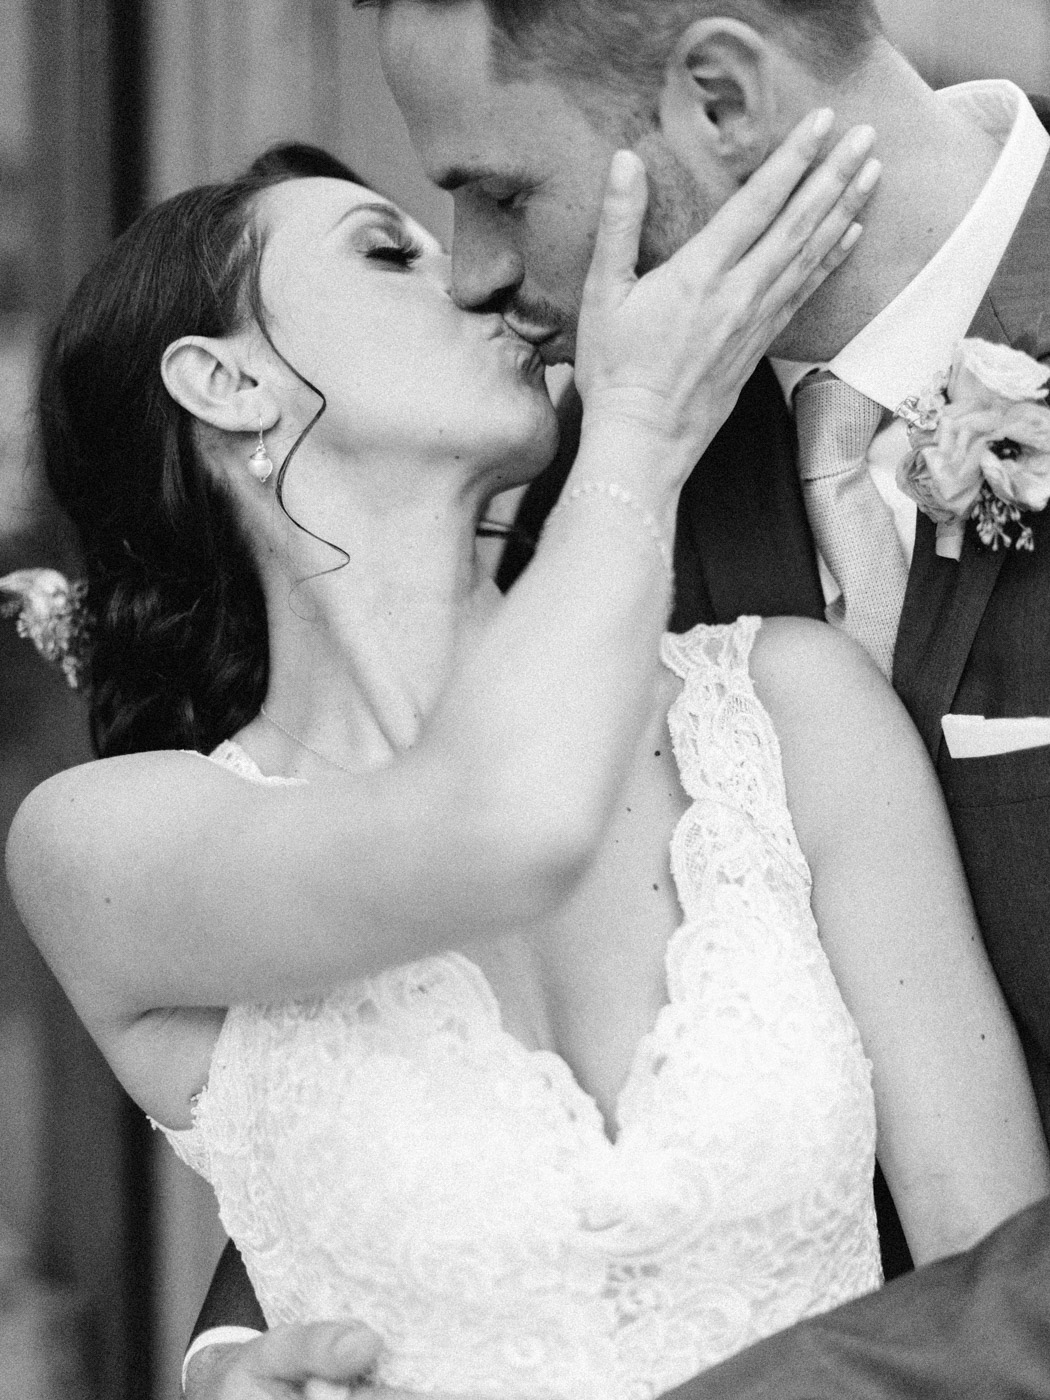 toronto_wedding_photographer_fine_art_documentary-453.jpg